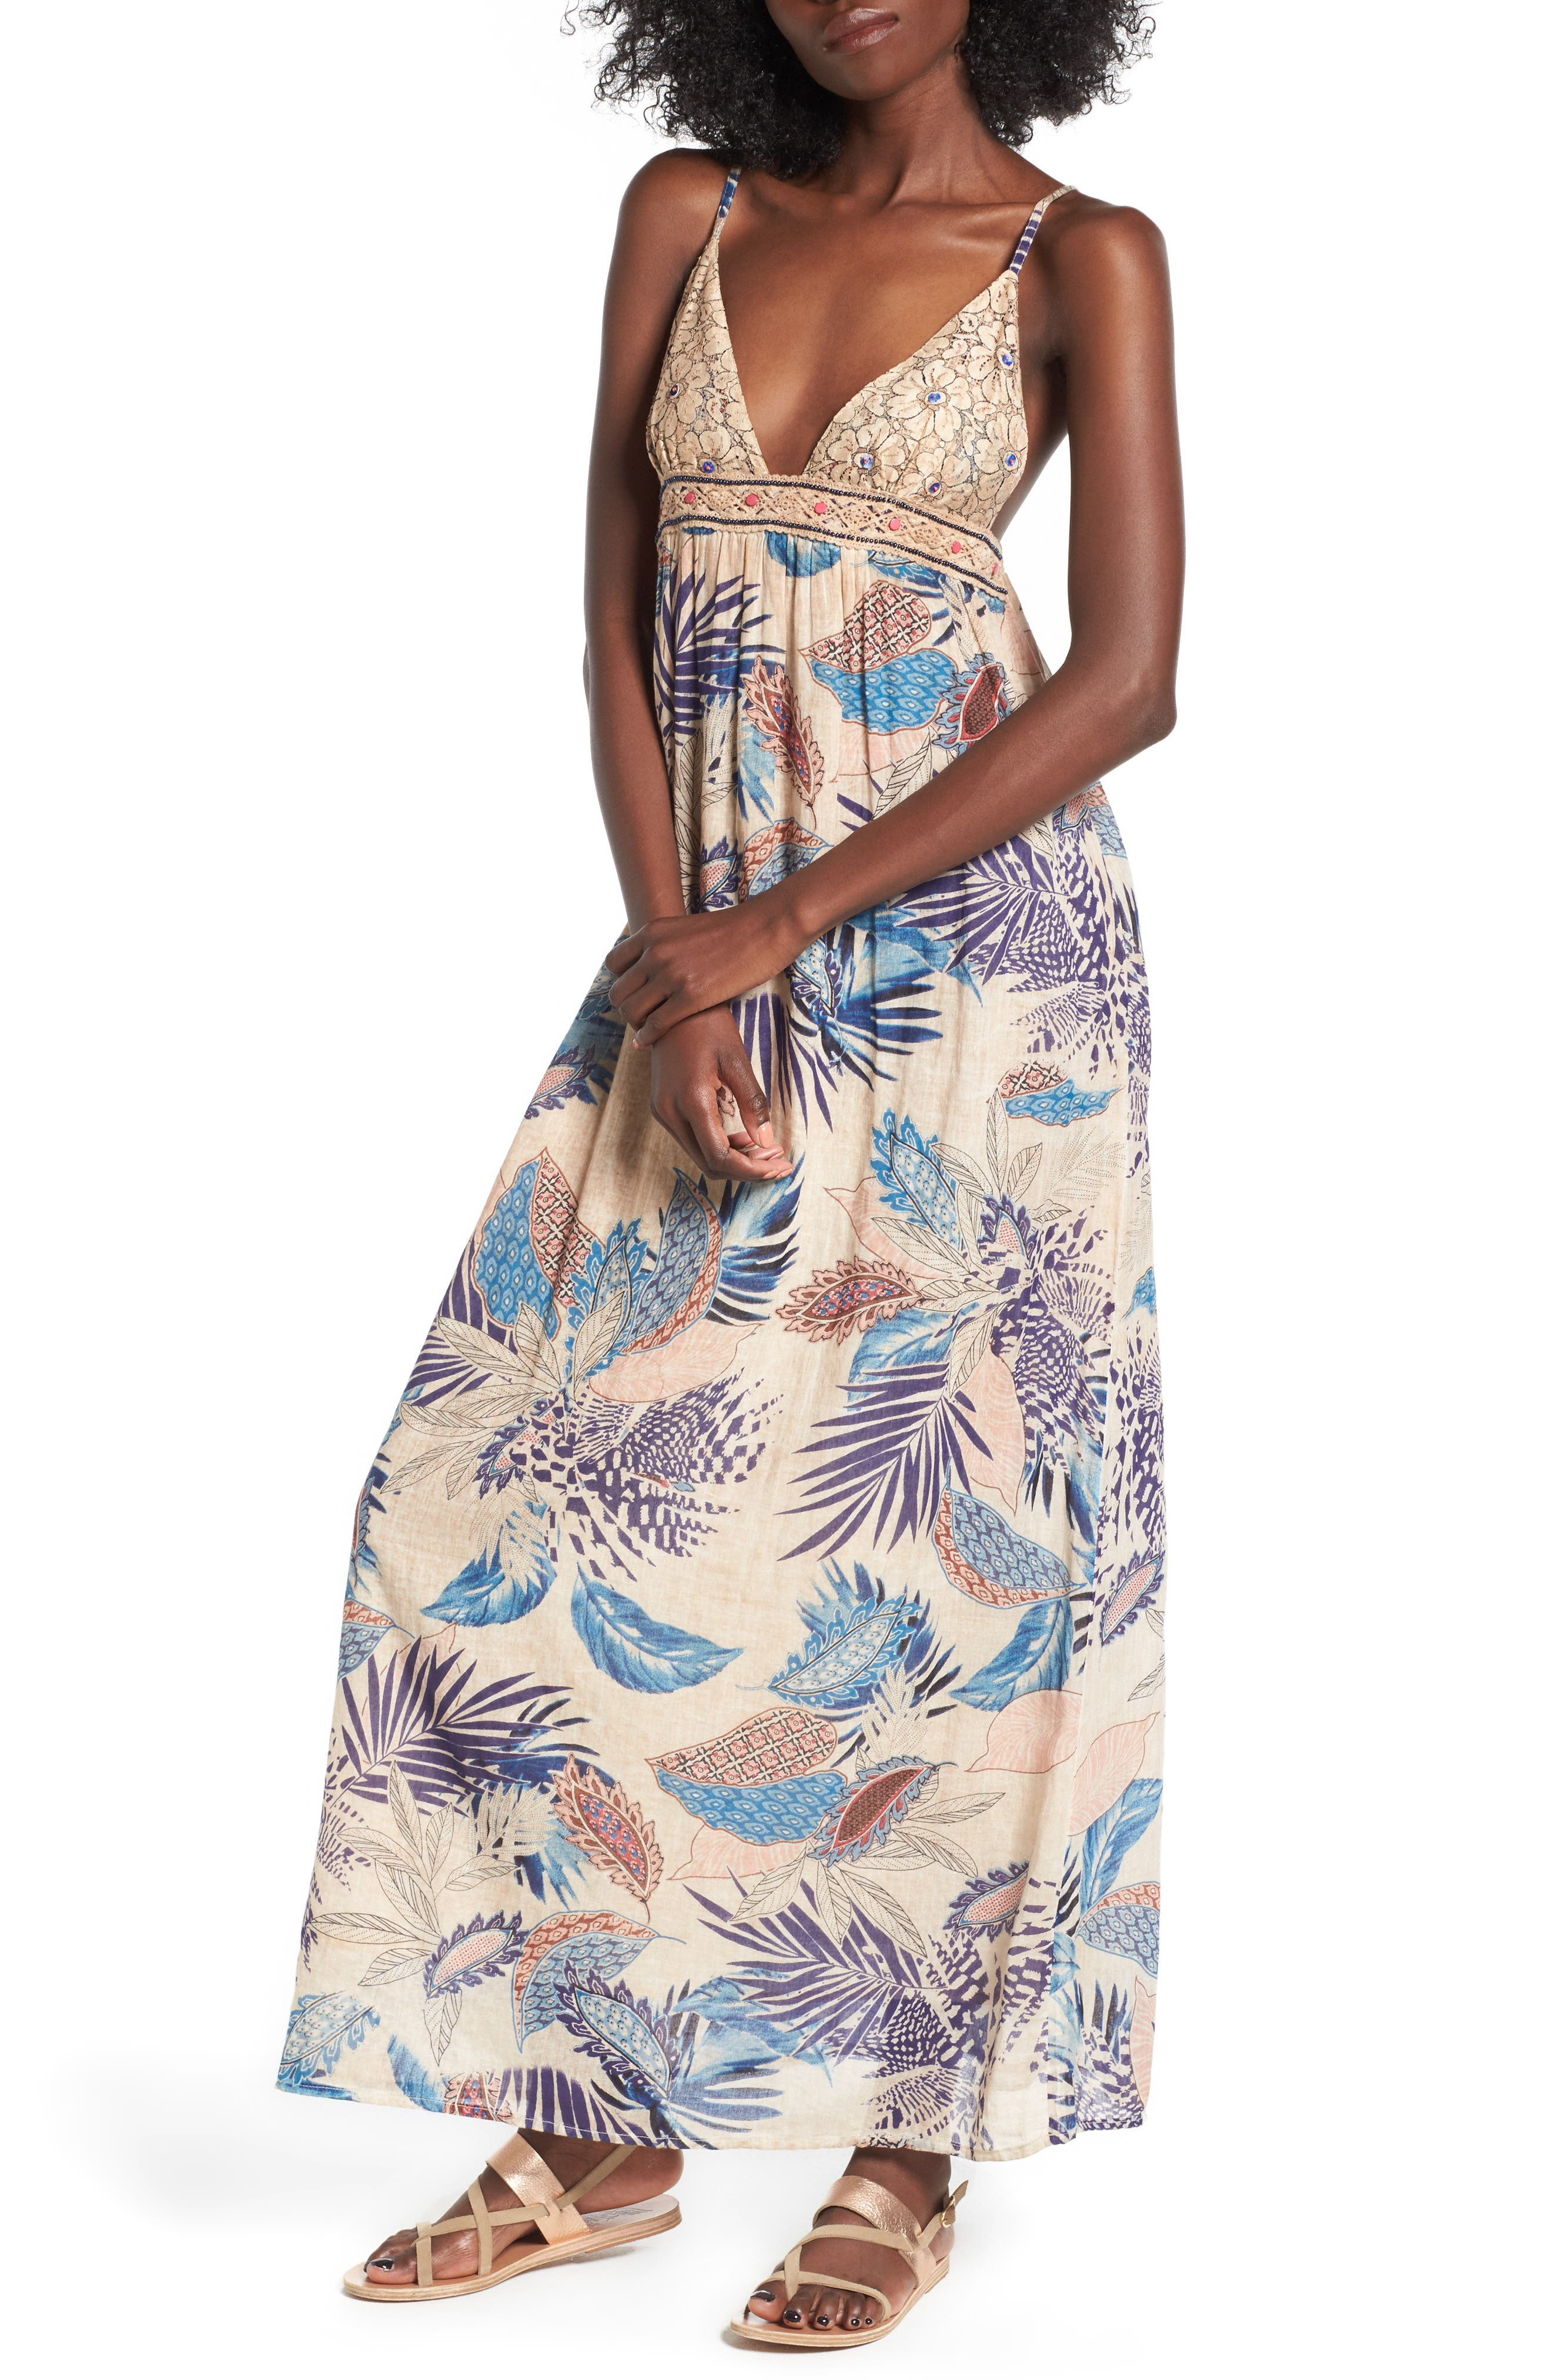 Raga Tropic Vibes Maxi Dress